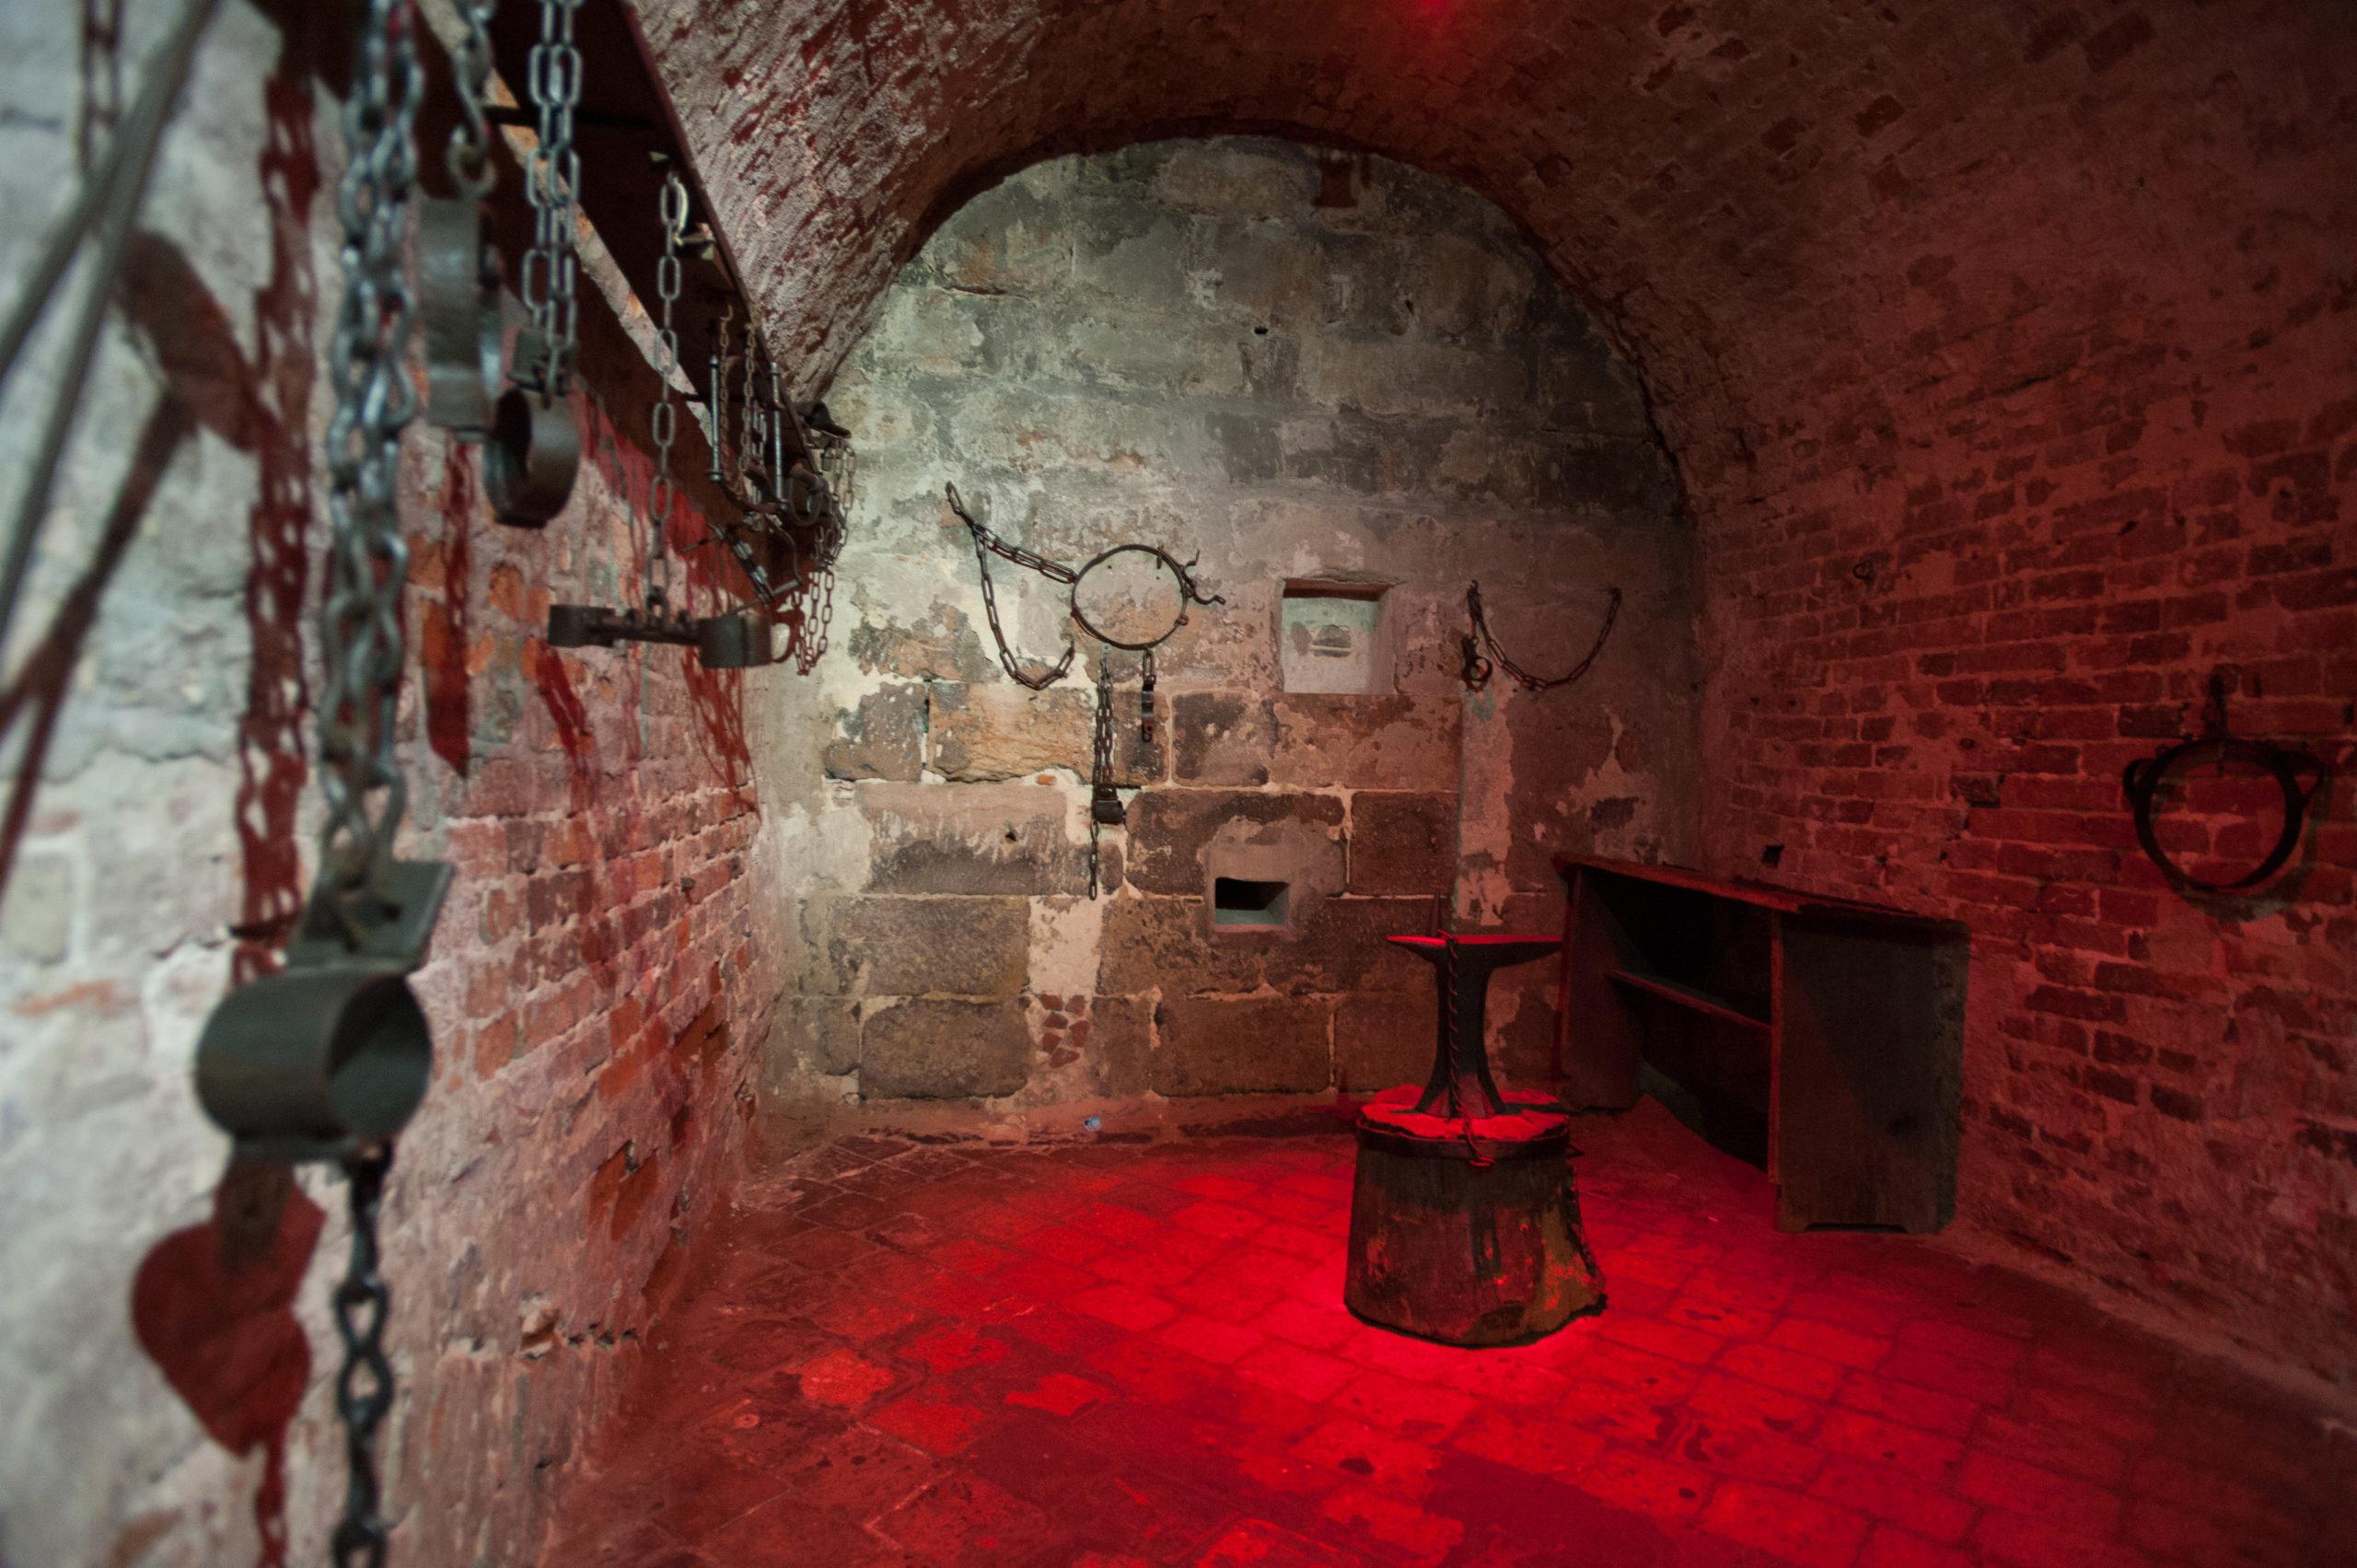 Lochgefängnisse Nuernberg | Nuremberg Medieval Dungeons